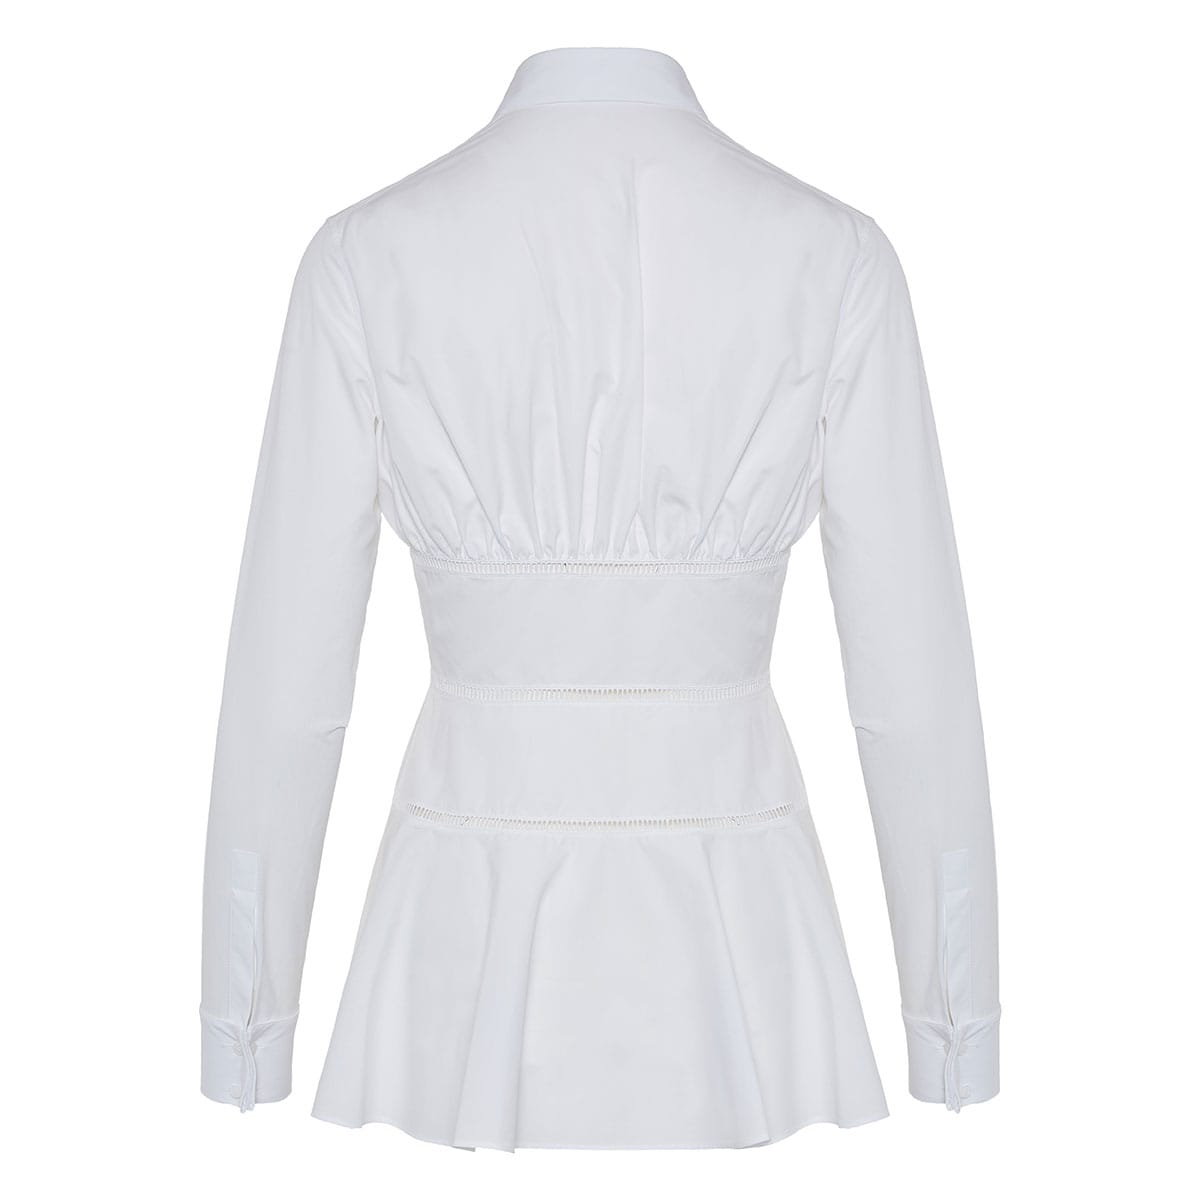 Poplin corset shirt